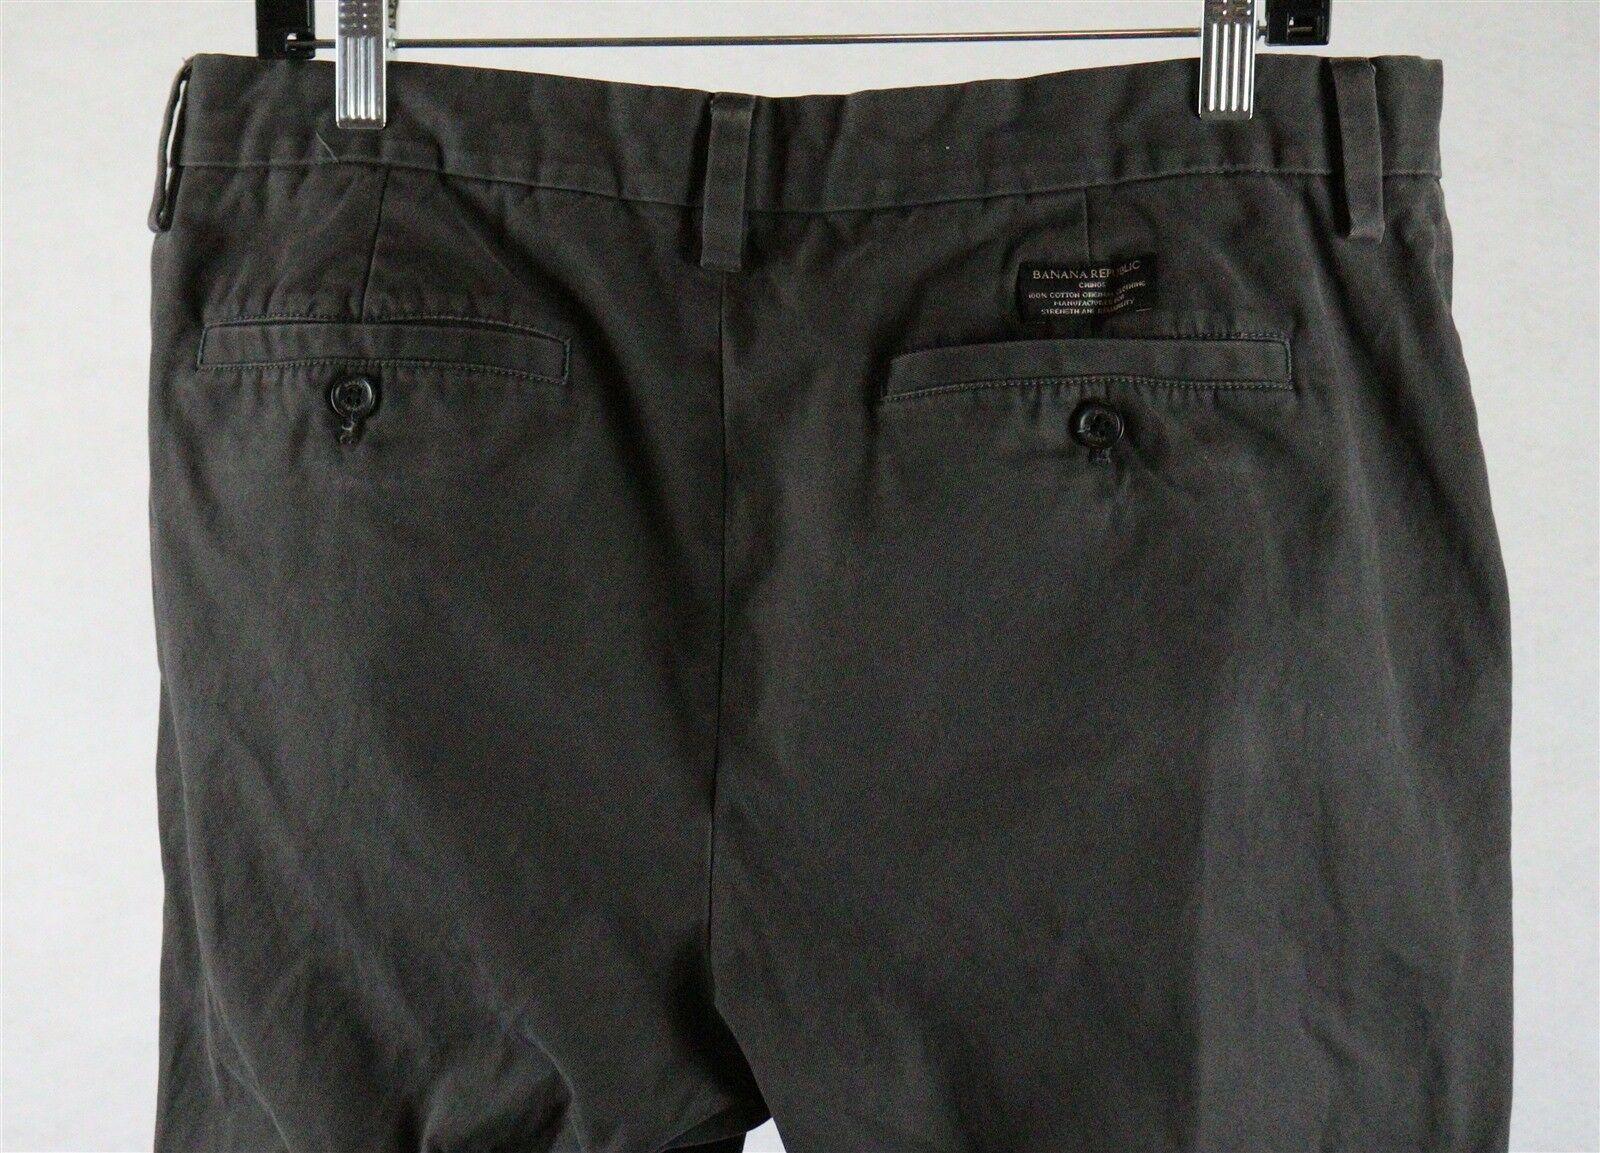 Banana Republic Mens Emerson Chino Pants Tag Size 34 x 34, Measures 34 x 32